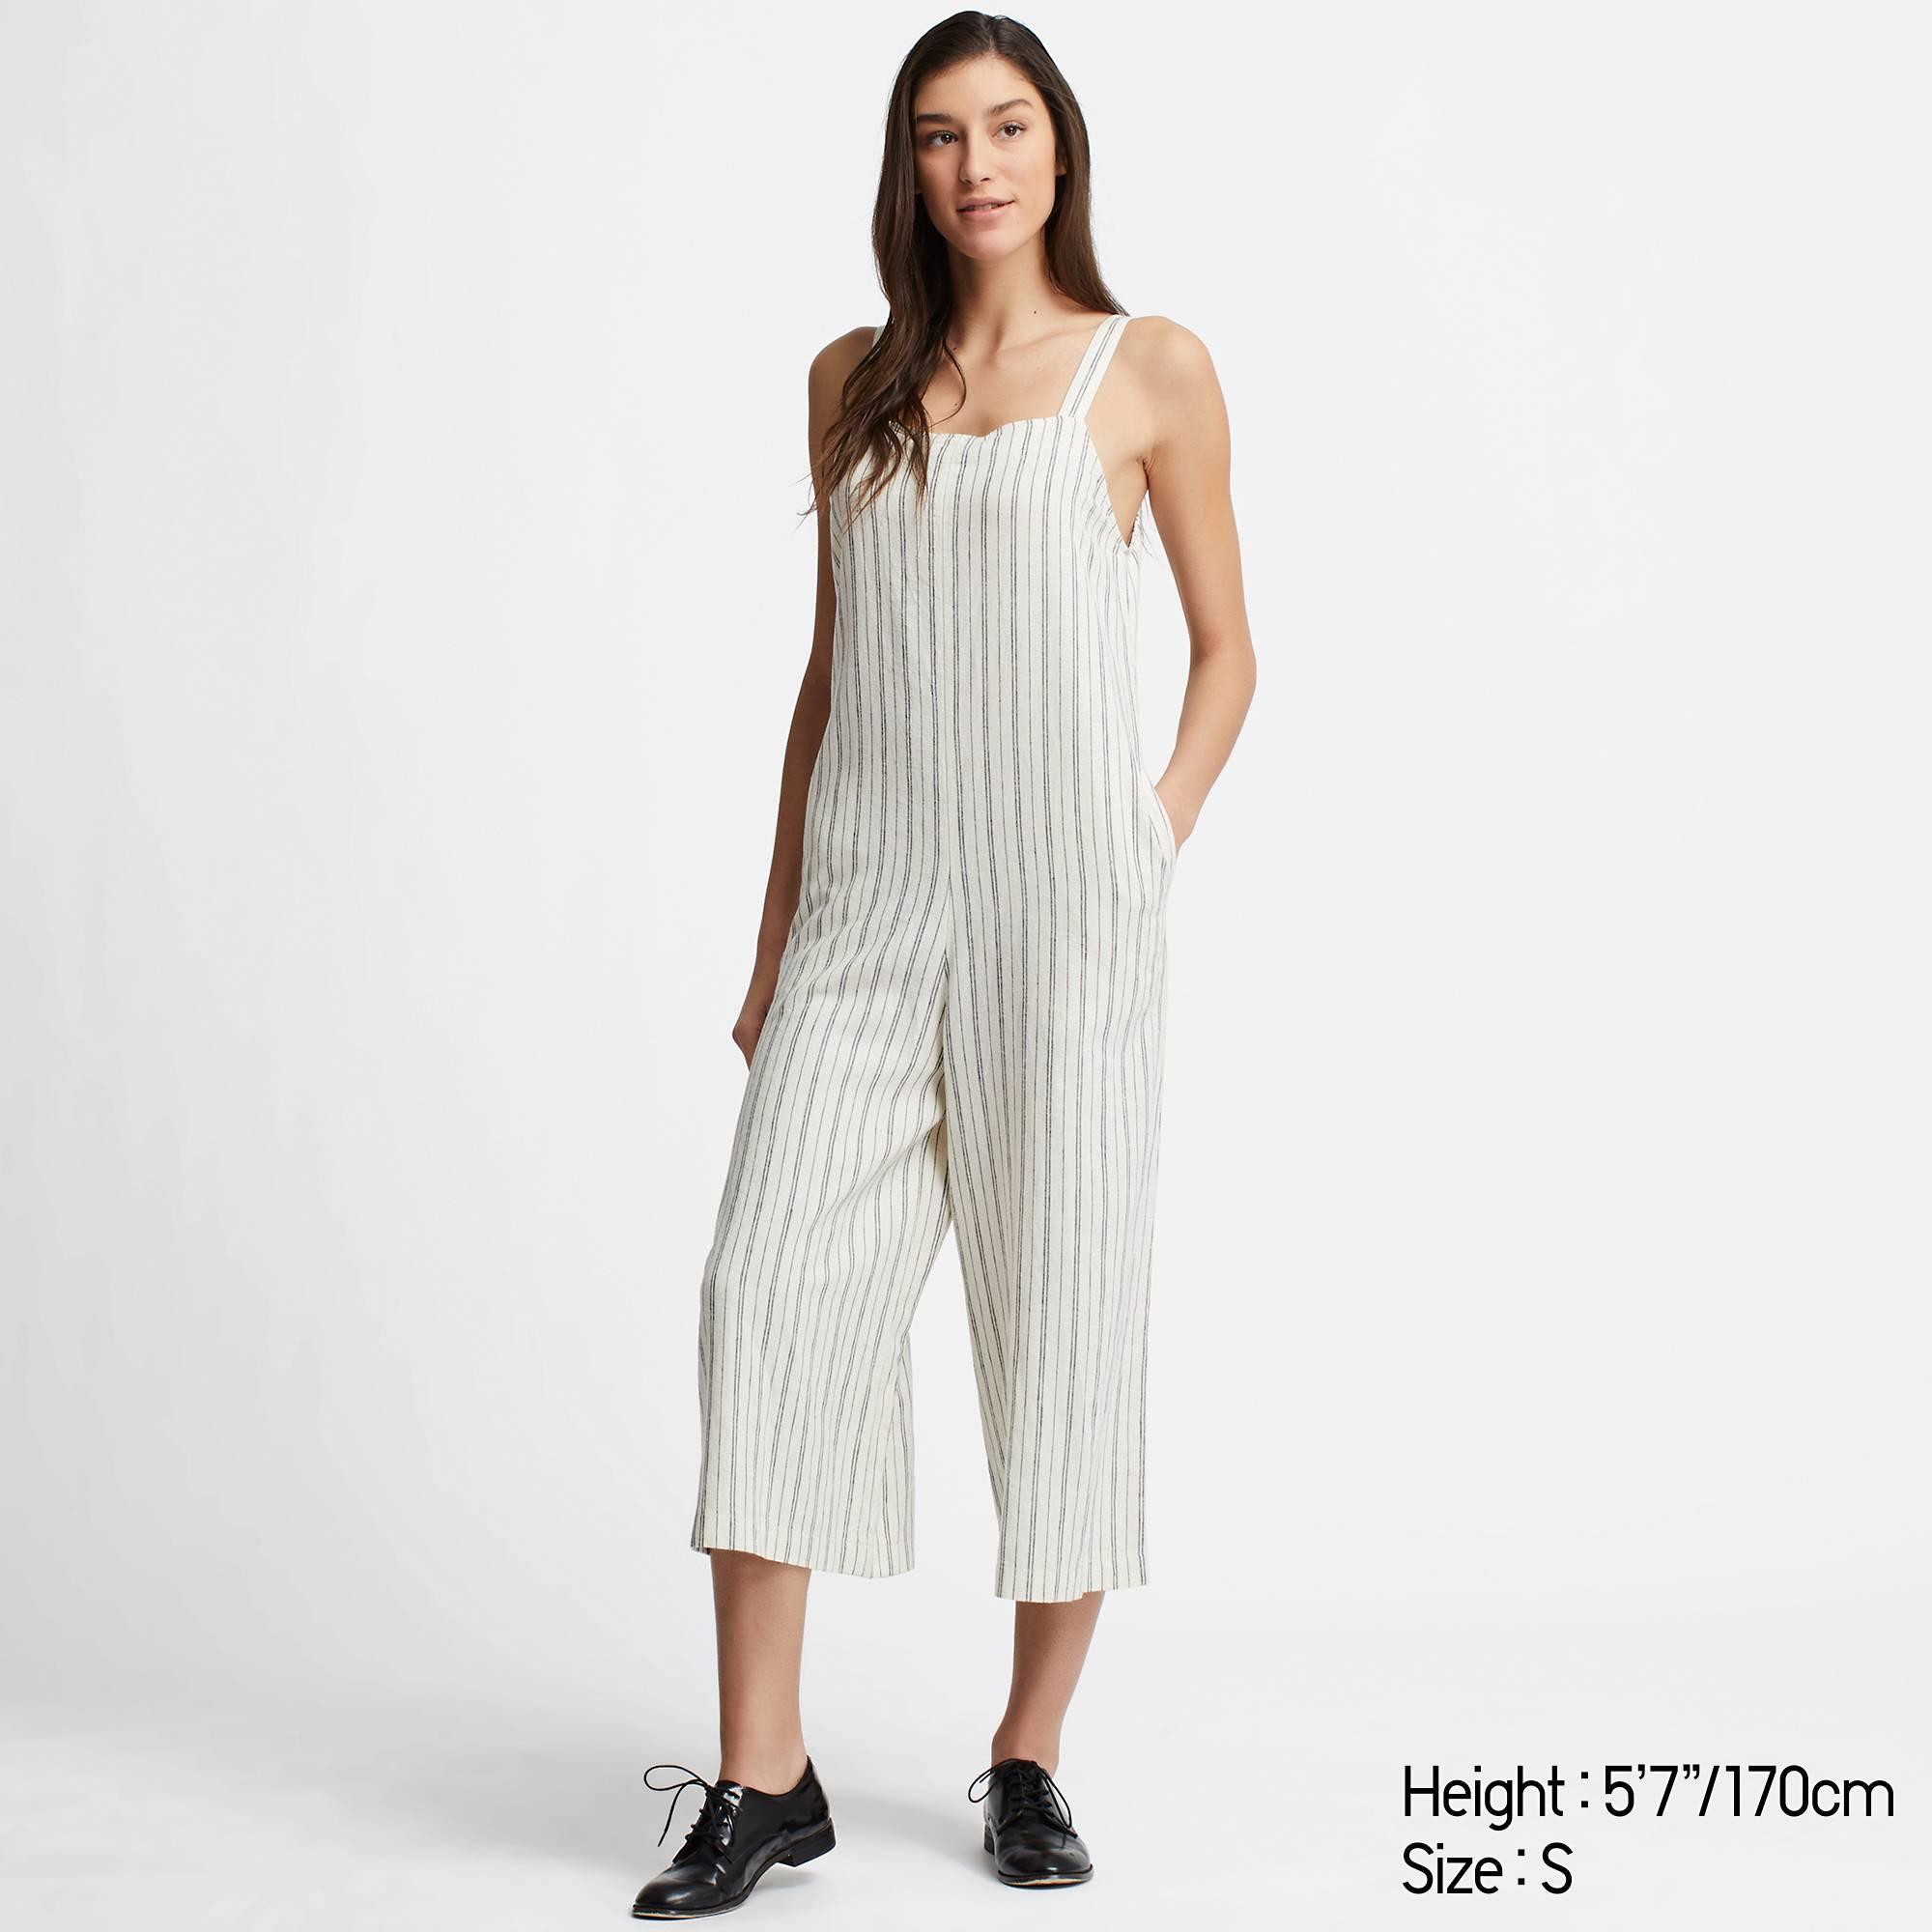 61d8c0a4358 Lyst - Uniqlo Women Linen Blend Striped Jumpsuit in White